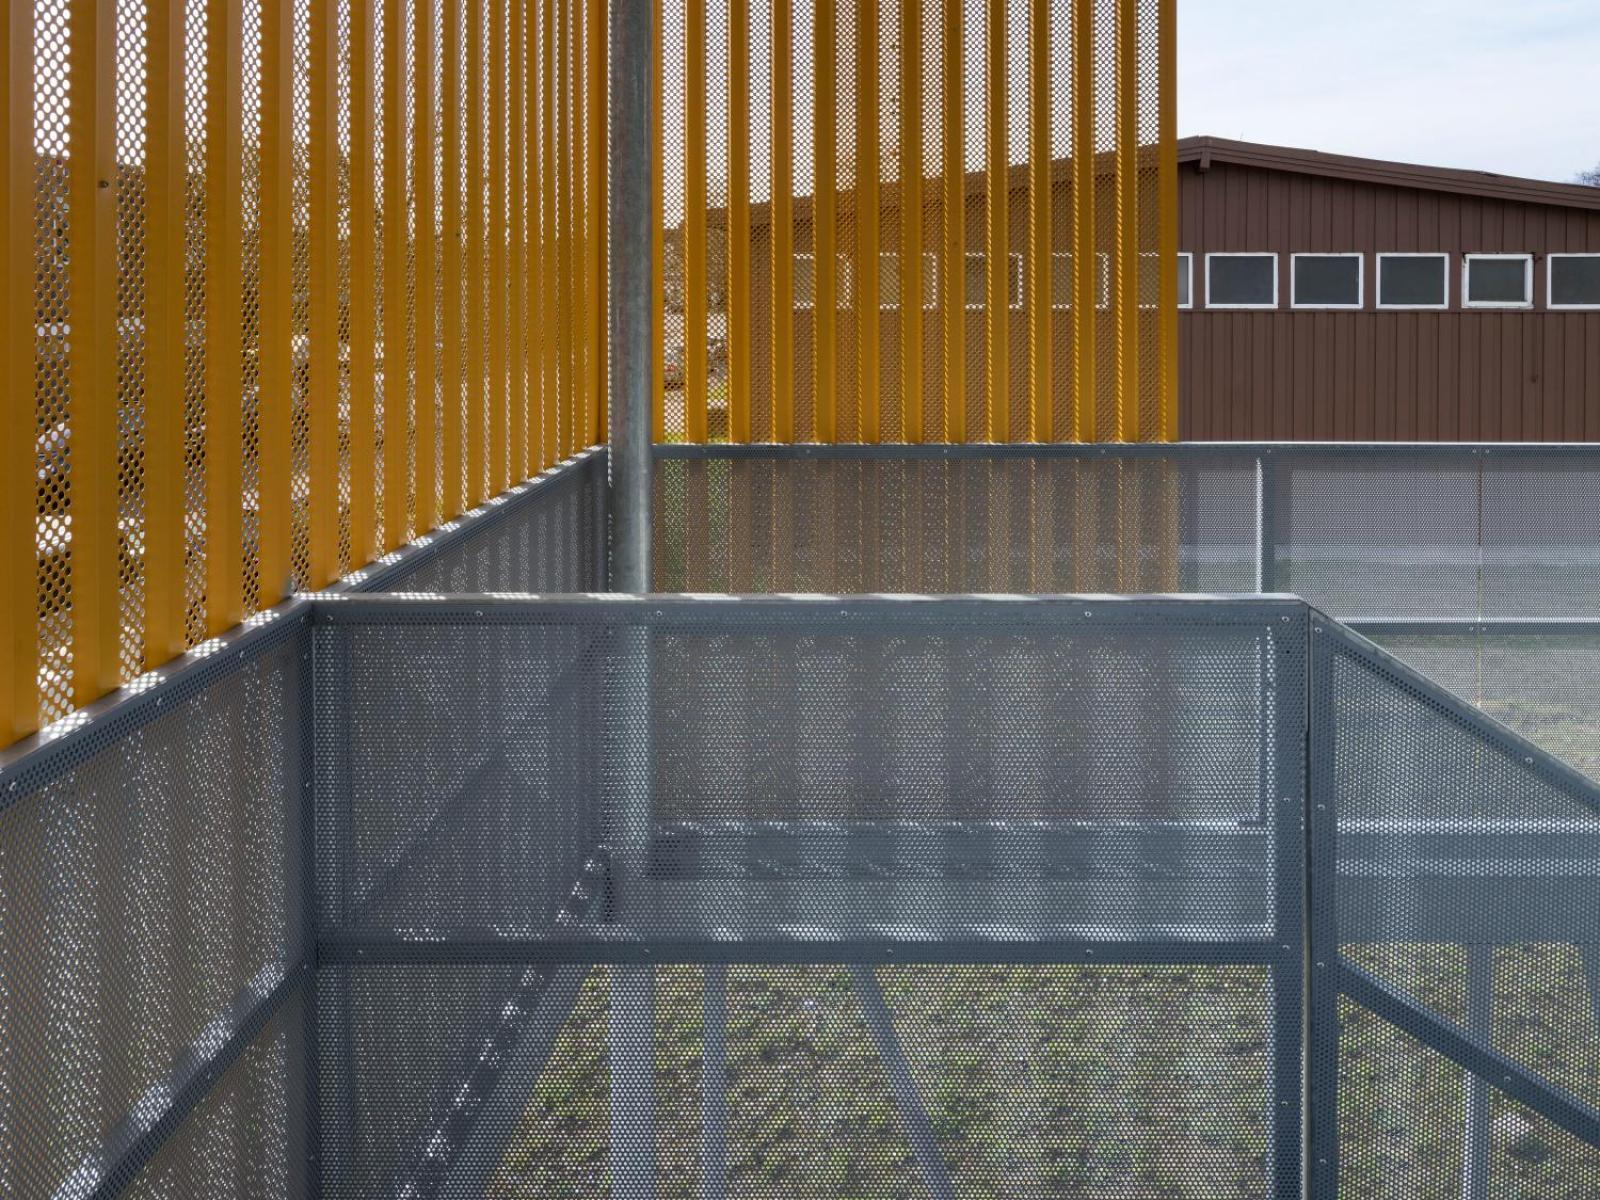 Flüchtlingsunterkunft Erkrath Treppendetail